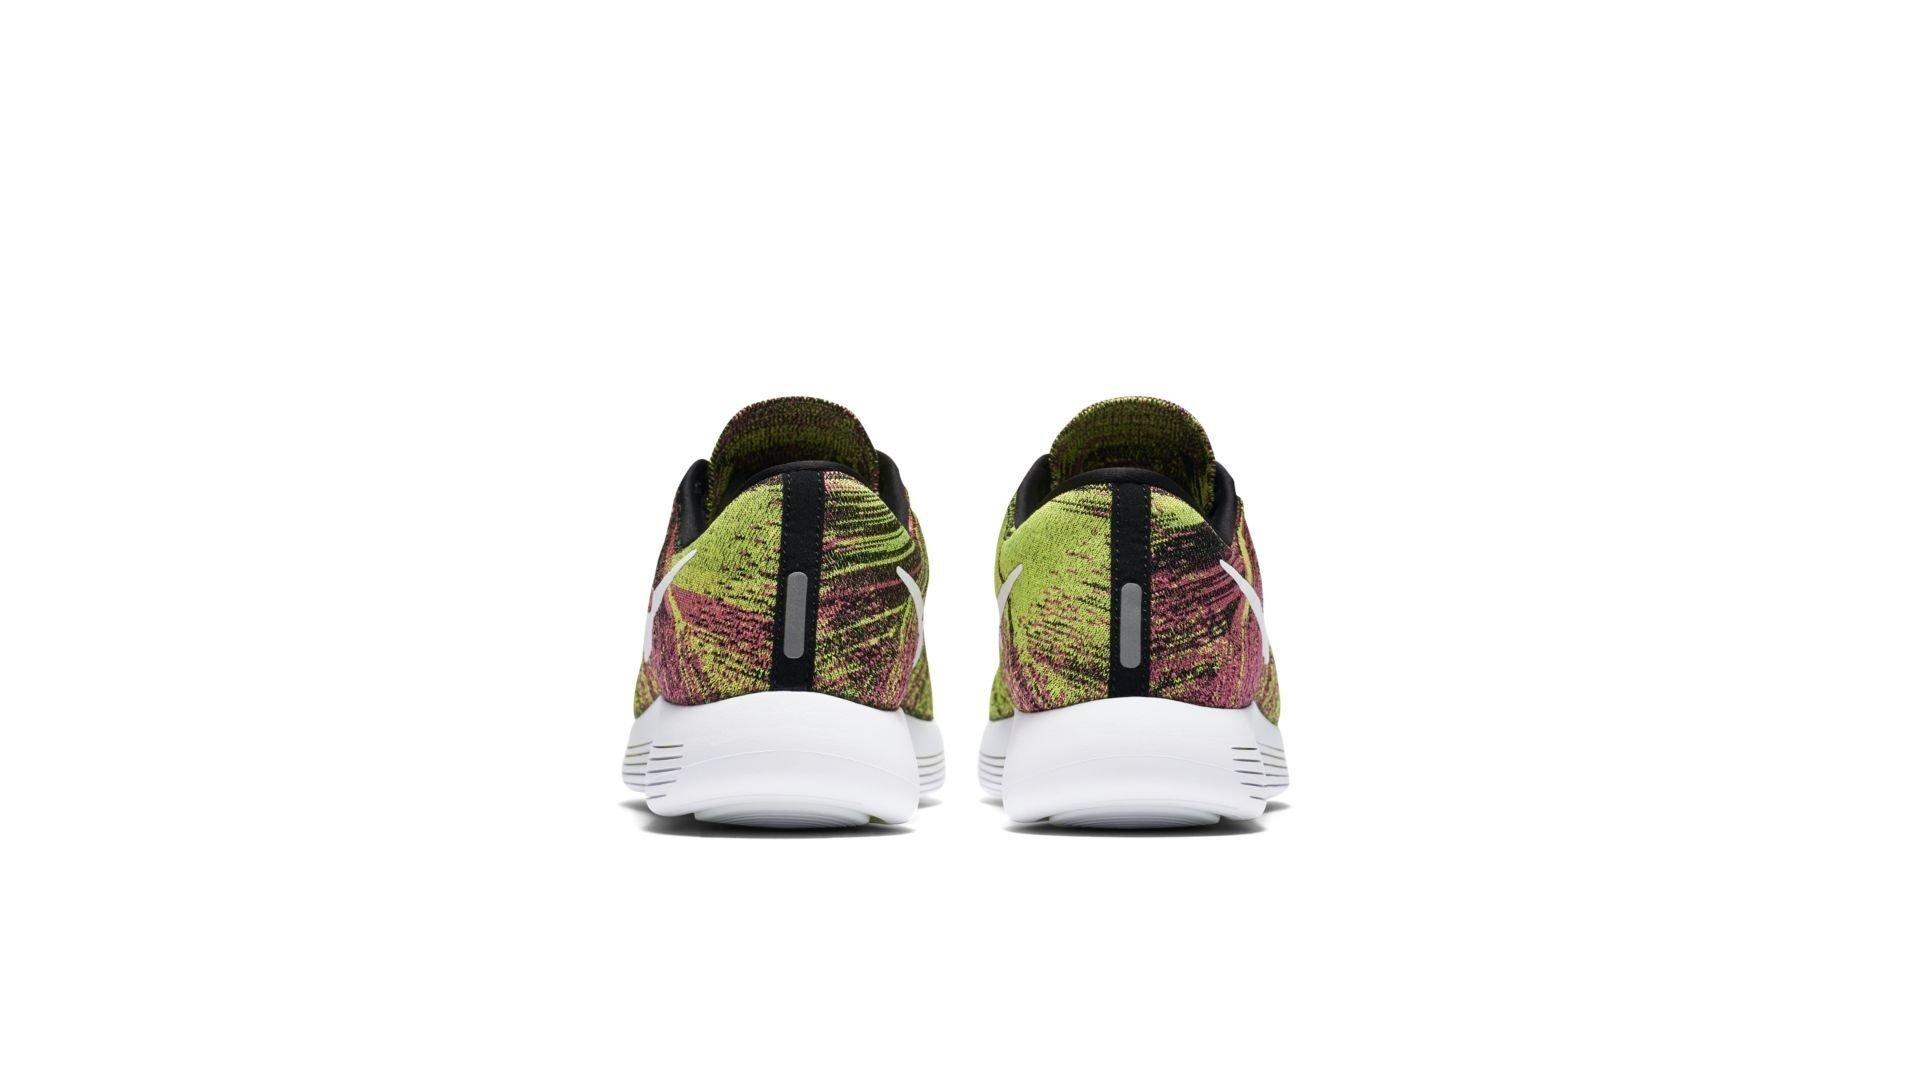 Nike LunarEpic Flyknit Low Multi-Color Unlimited (844862-999)